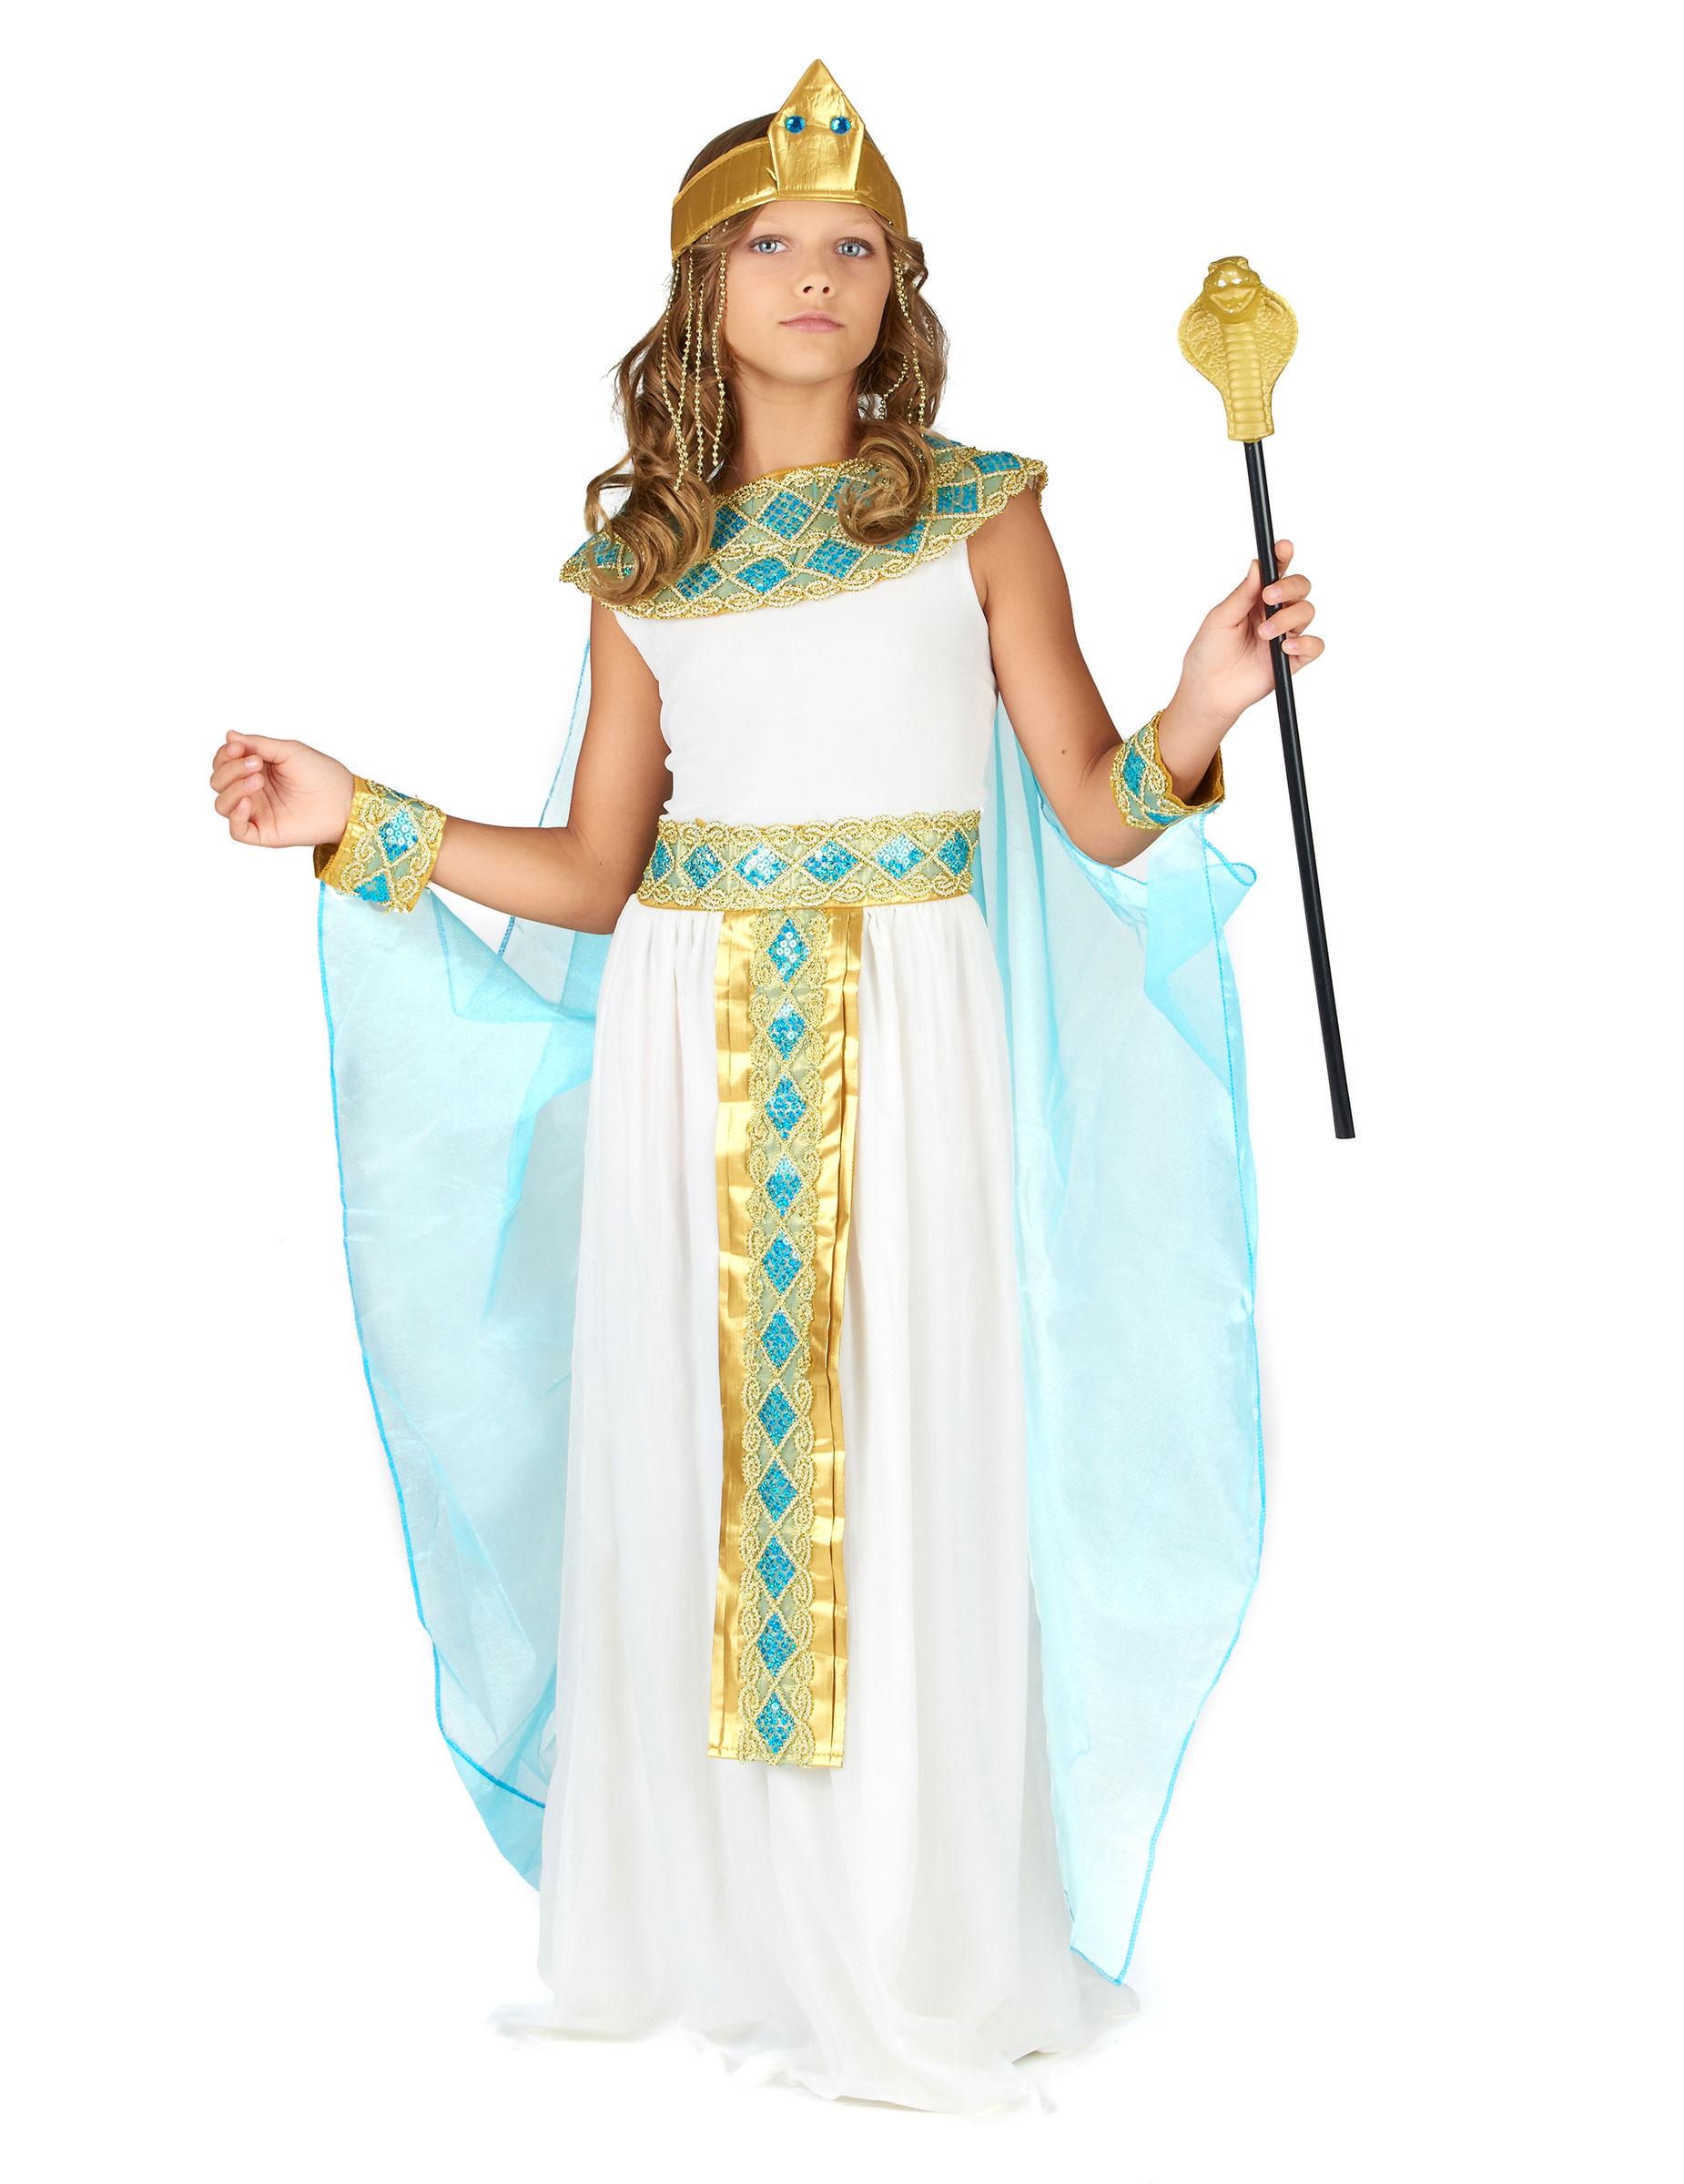 Egyptian queen costume for children